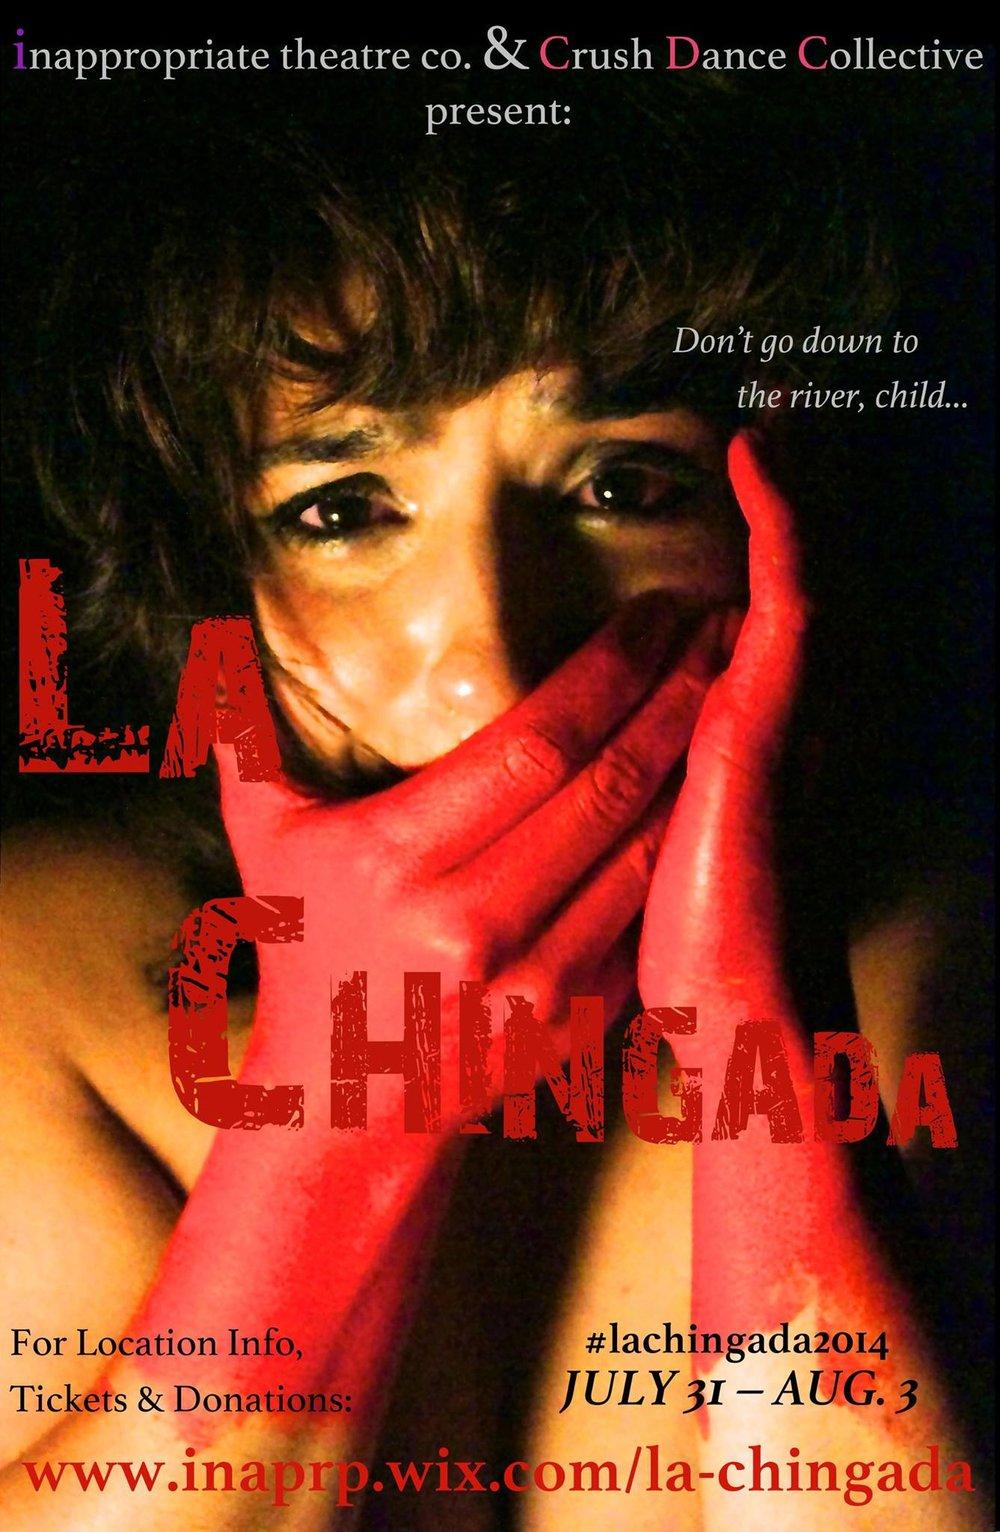 La Chingada 9.jpg